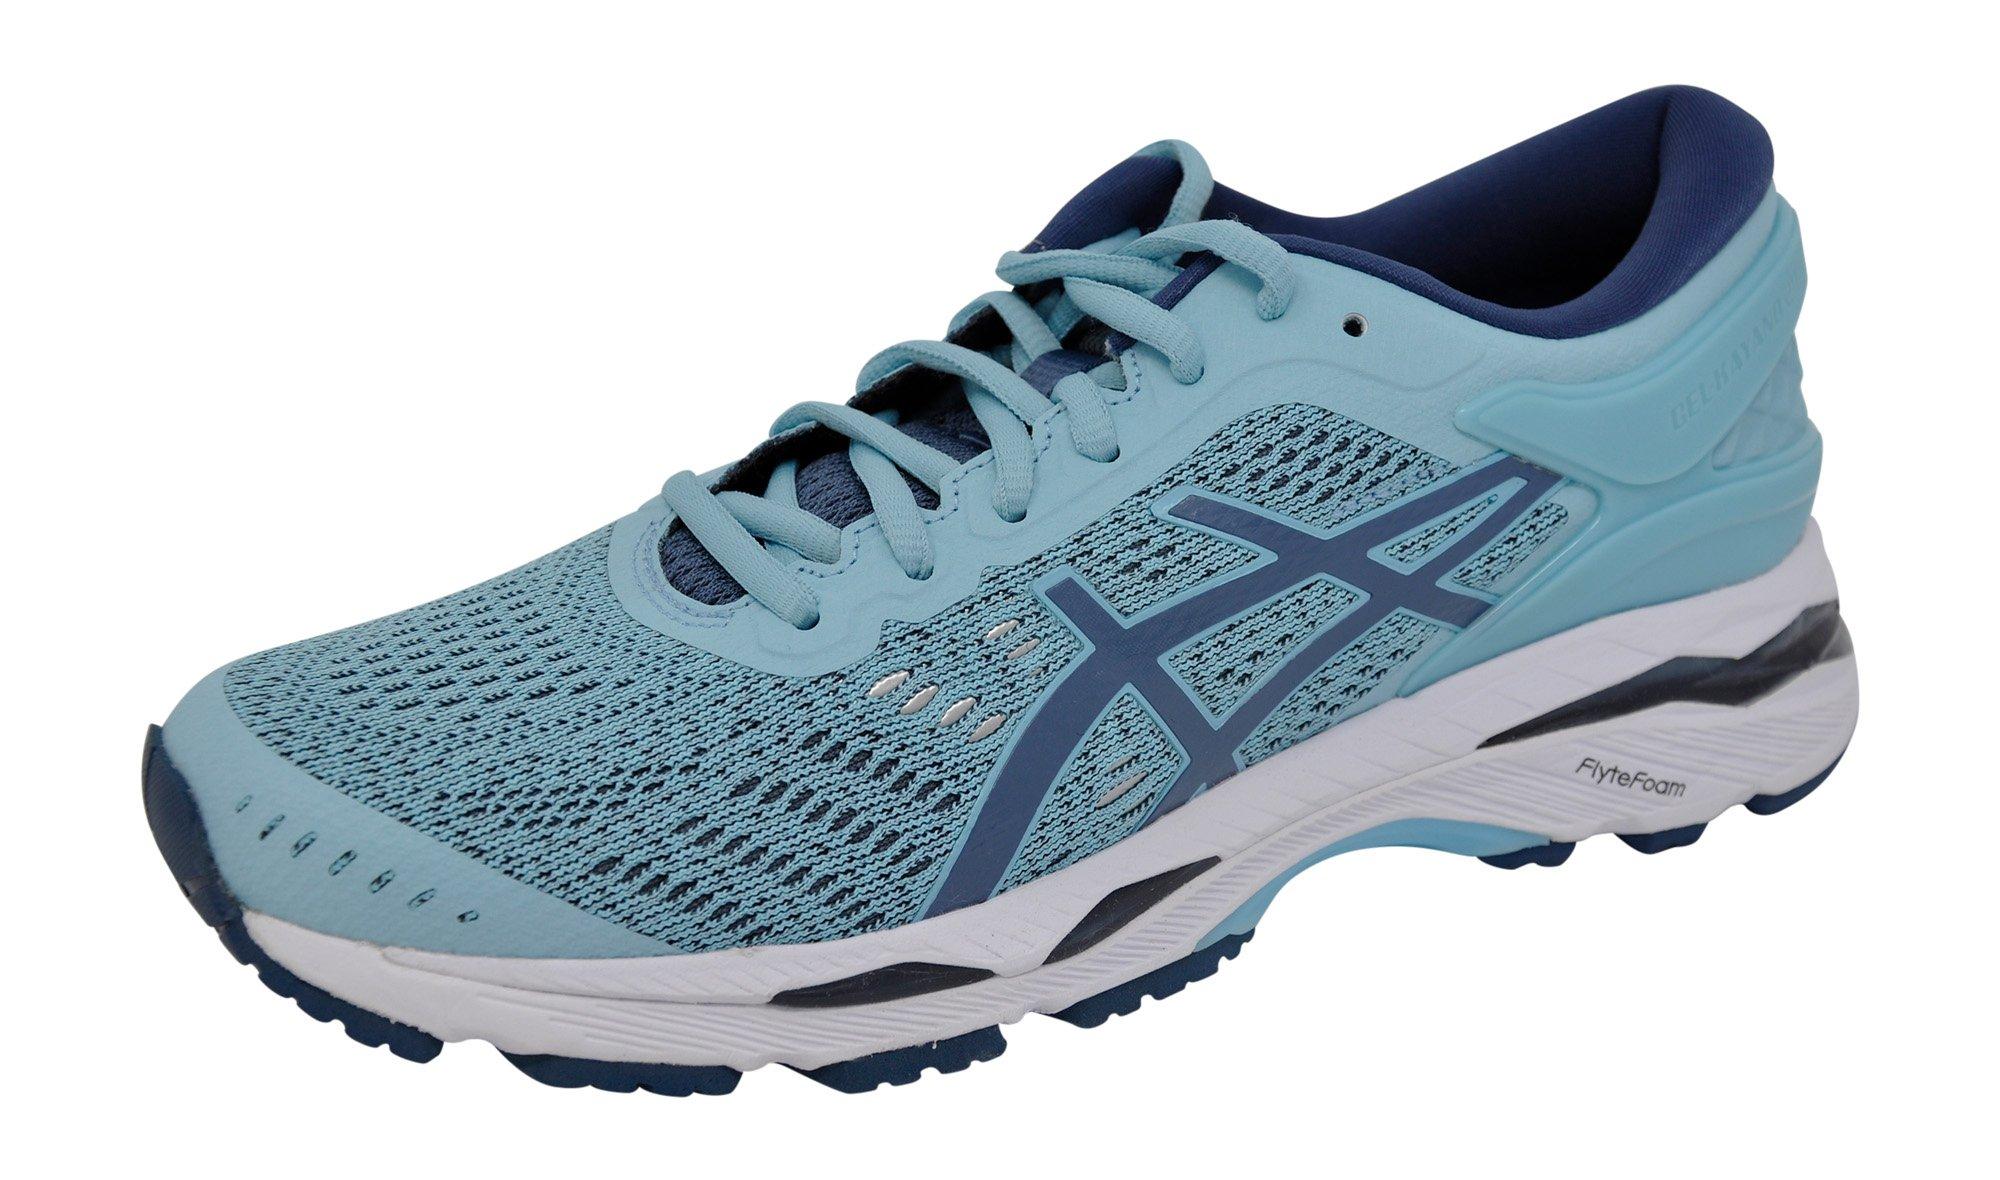 3c2f54547473 Galleon - ASICS Women s Gel-Kayano 24 Running-Shoes Blue Yellow